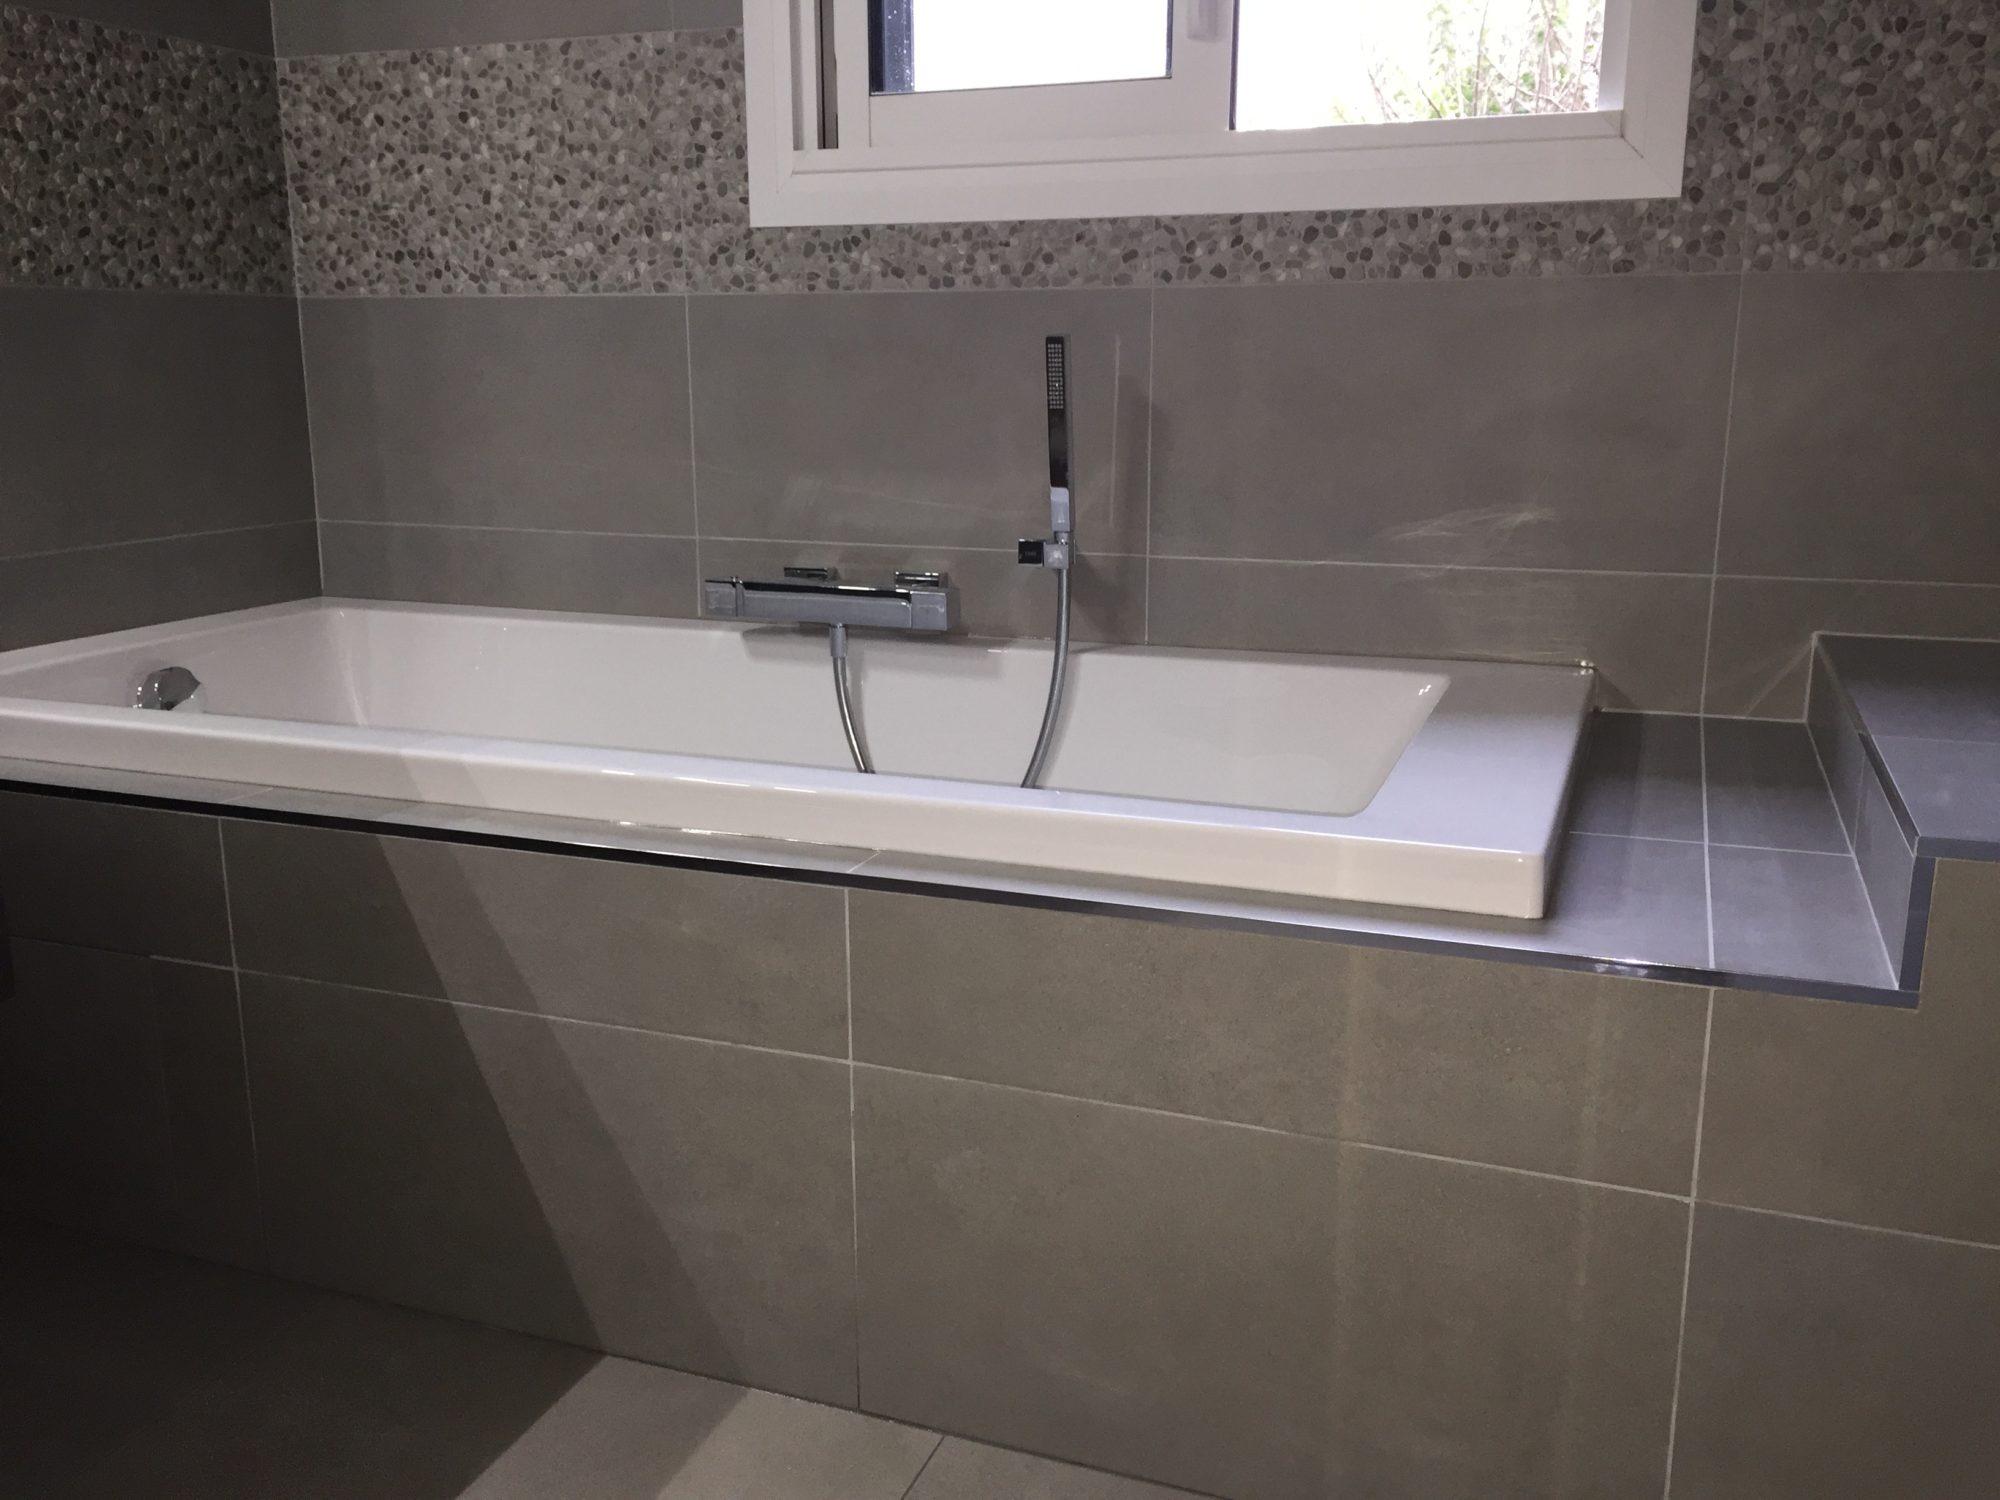 Toulouse carrelage stunning carrelage salle de bain gris for Carrelage salle de bain toulouse